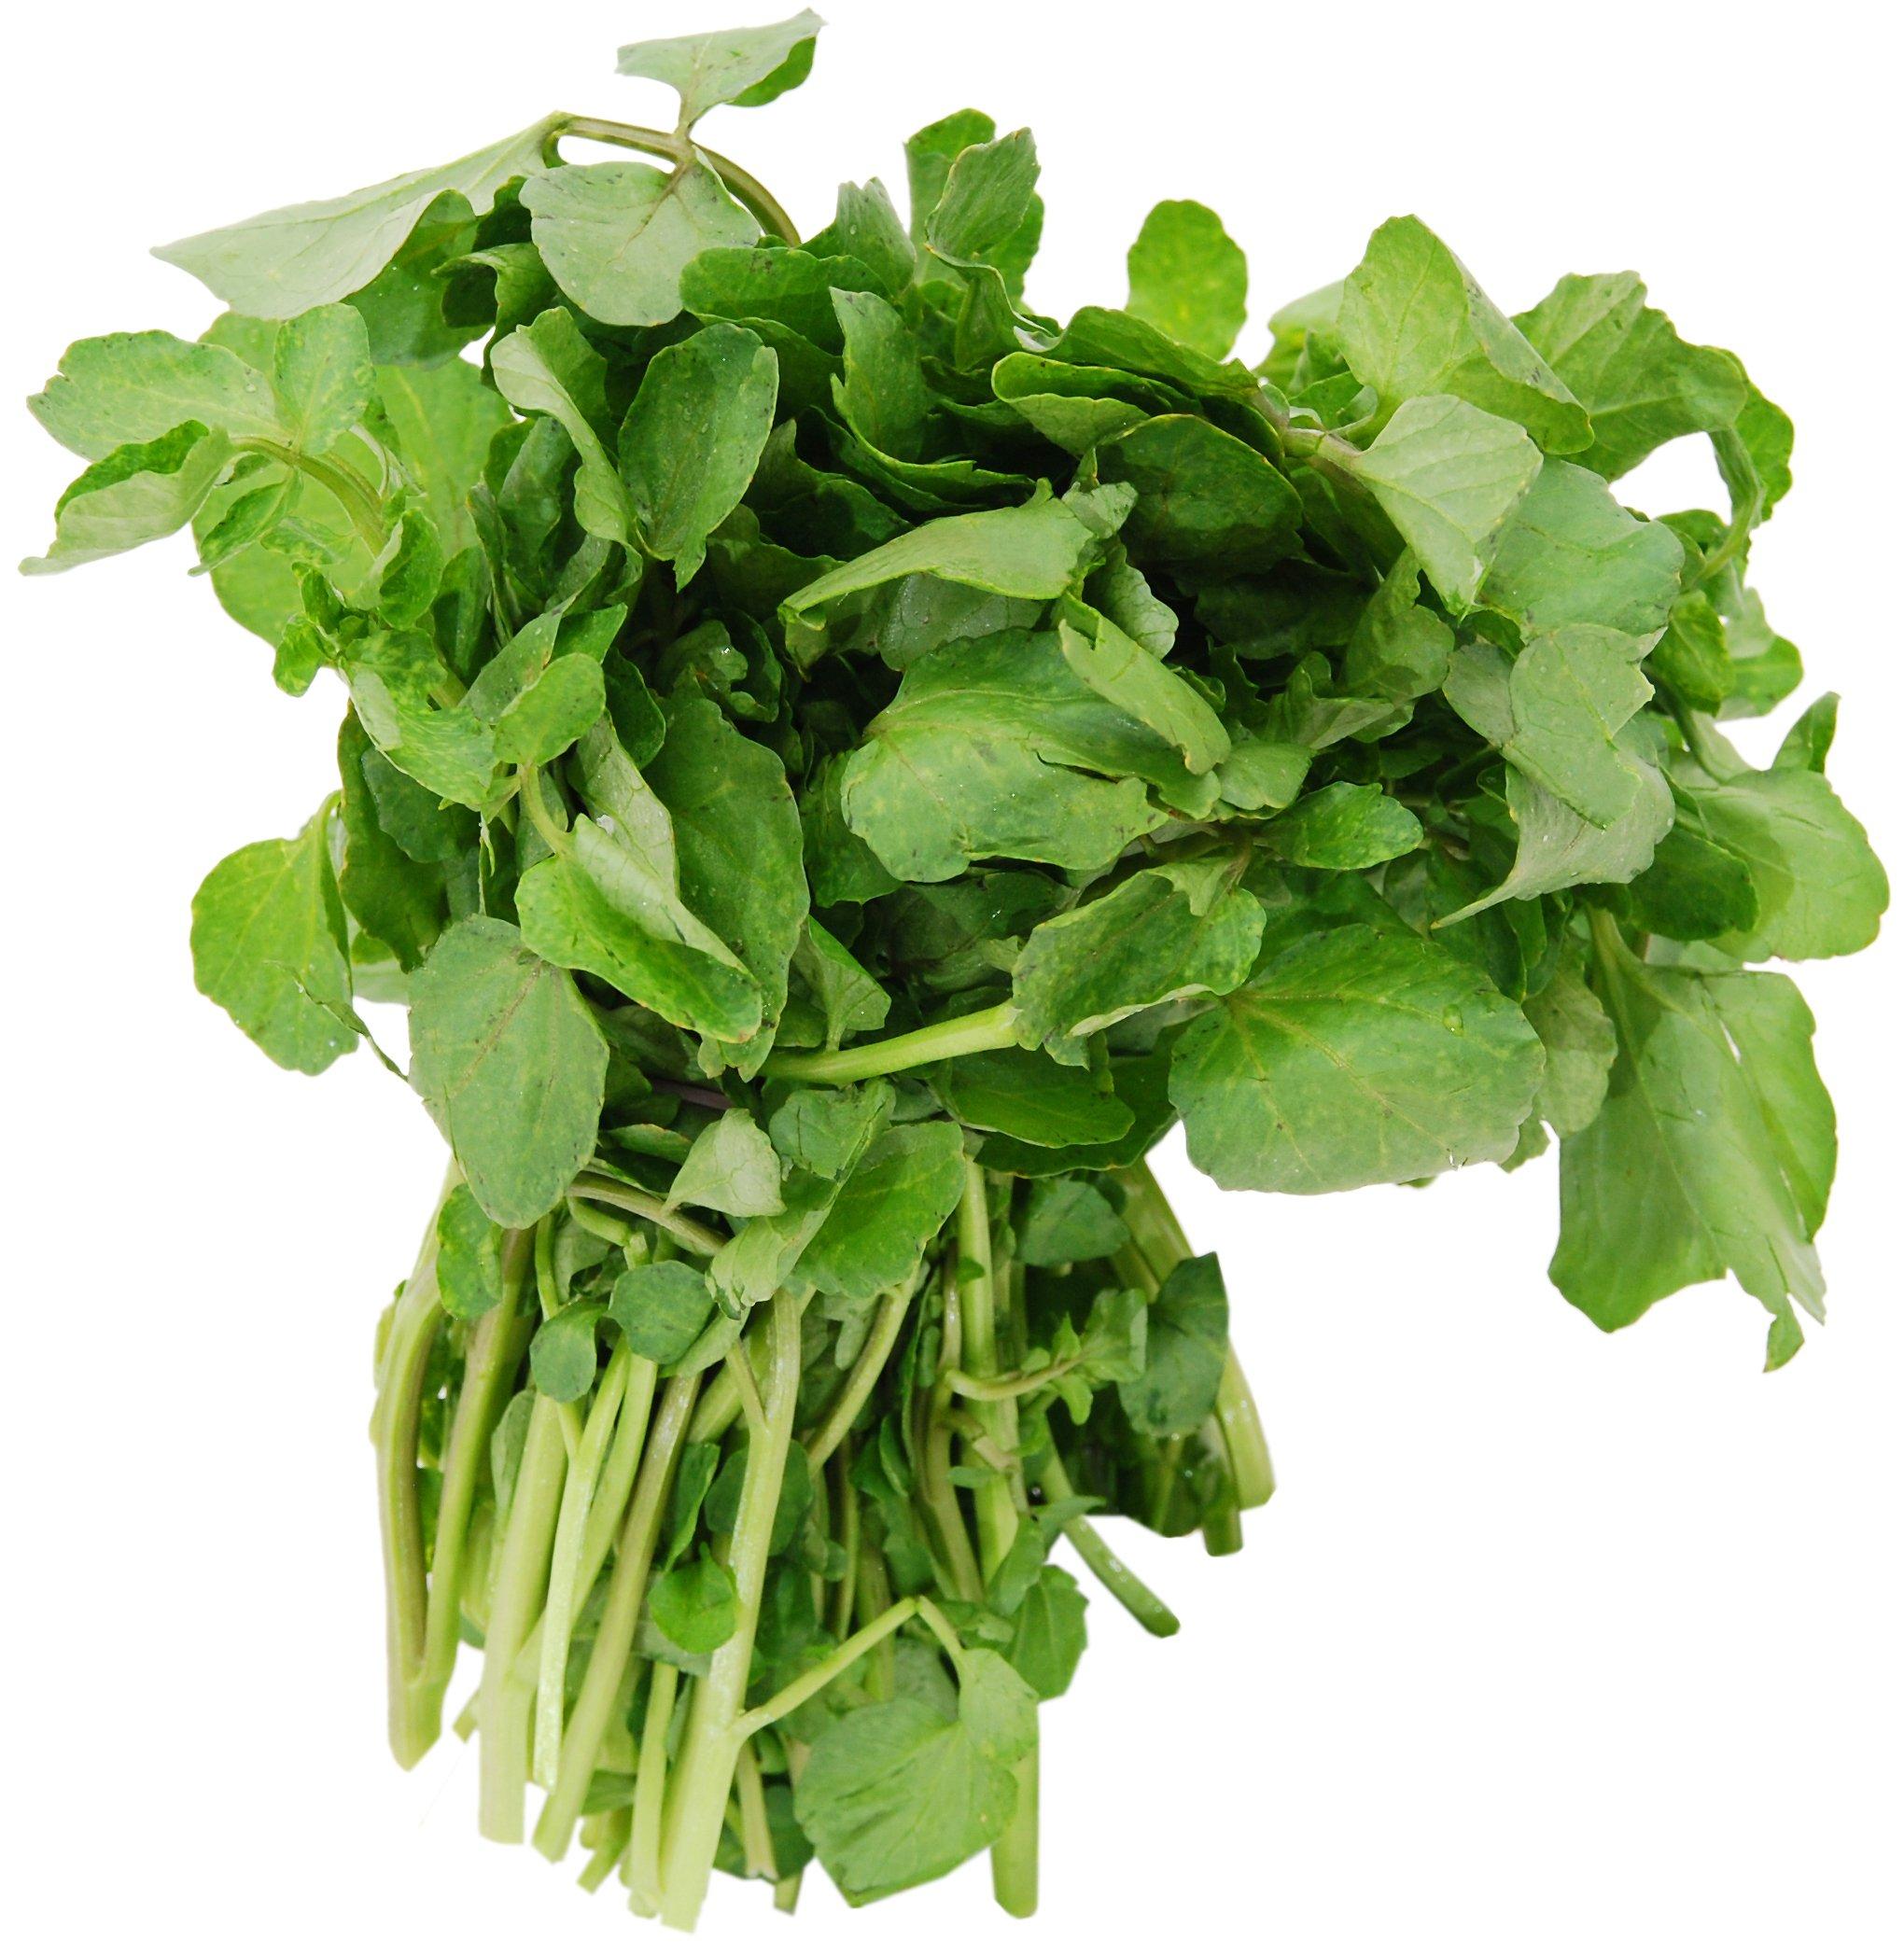 Fresh Watercress - Shop Lettuce & Leafy Greens at H-E-B